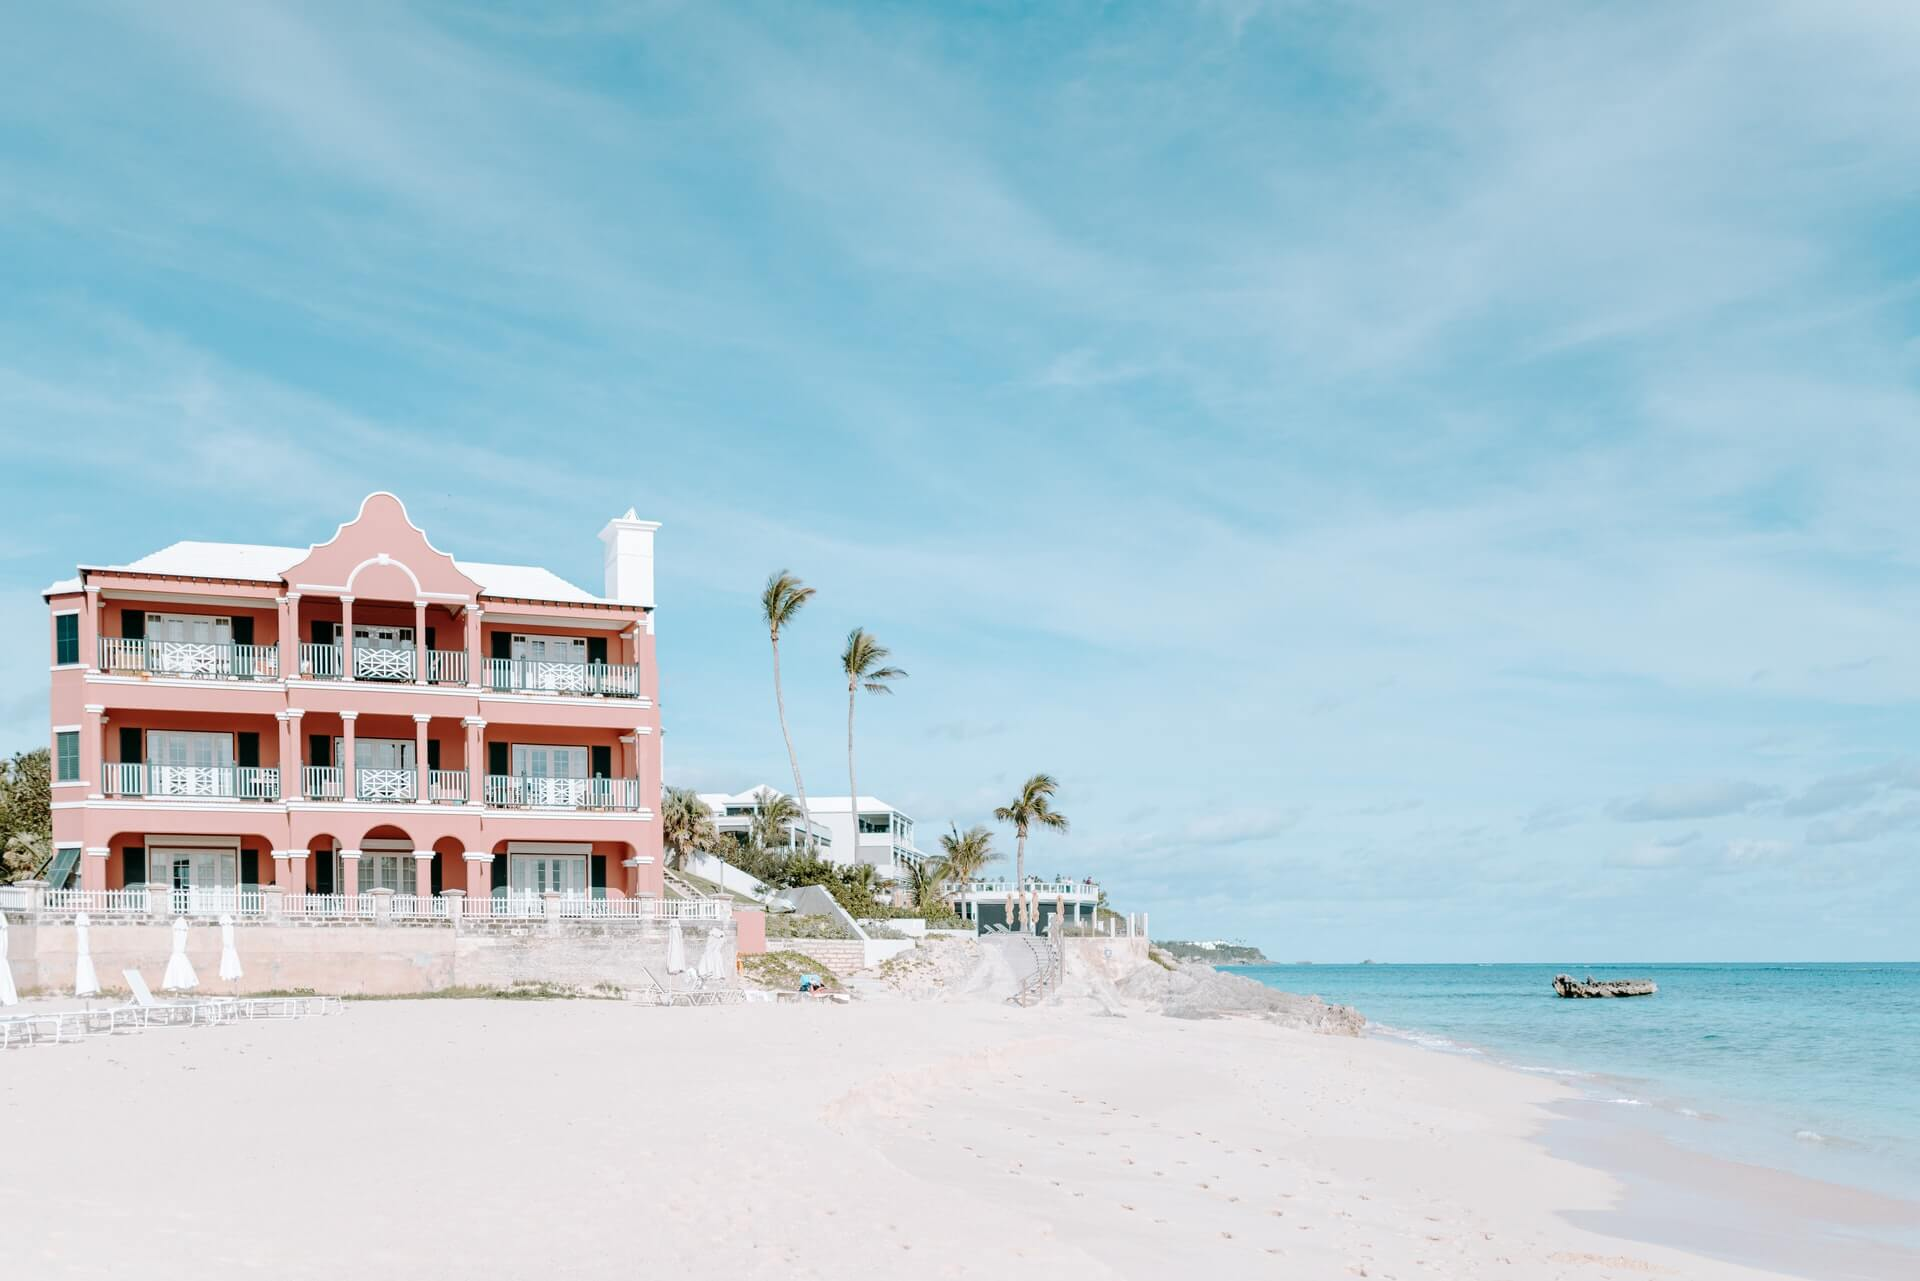 A beautiful beachside villa on a tropical beach in Bermuda